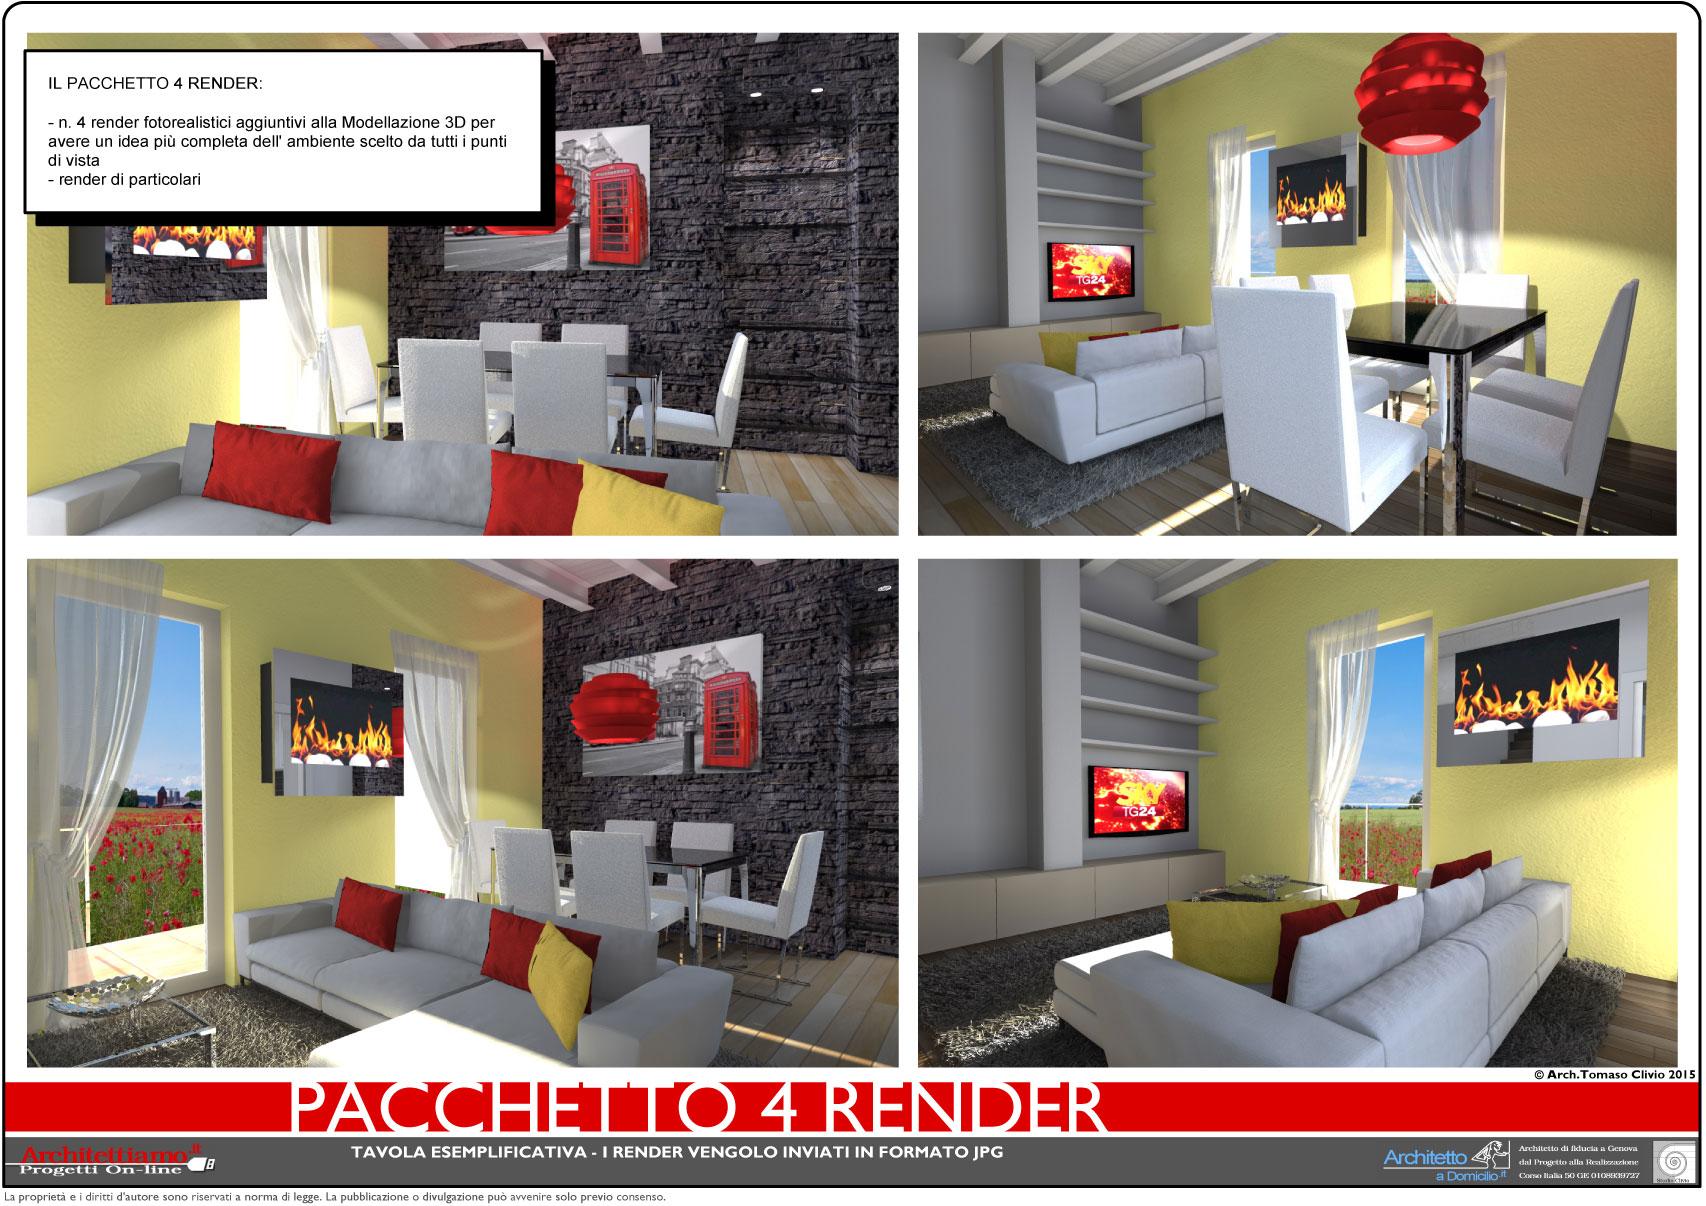 Pacchetto 4 Render